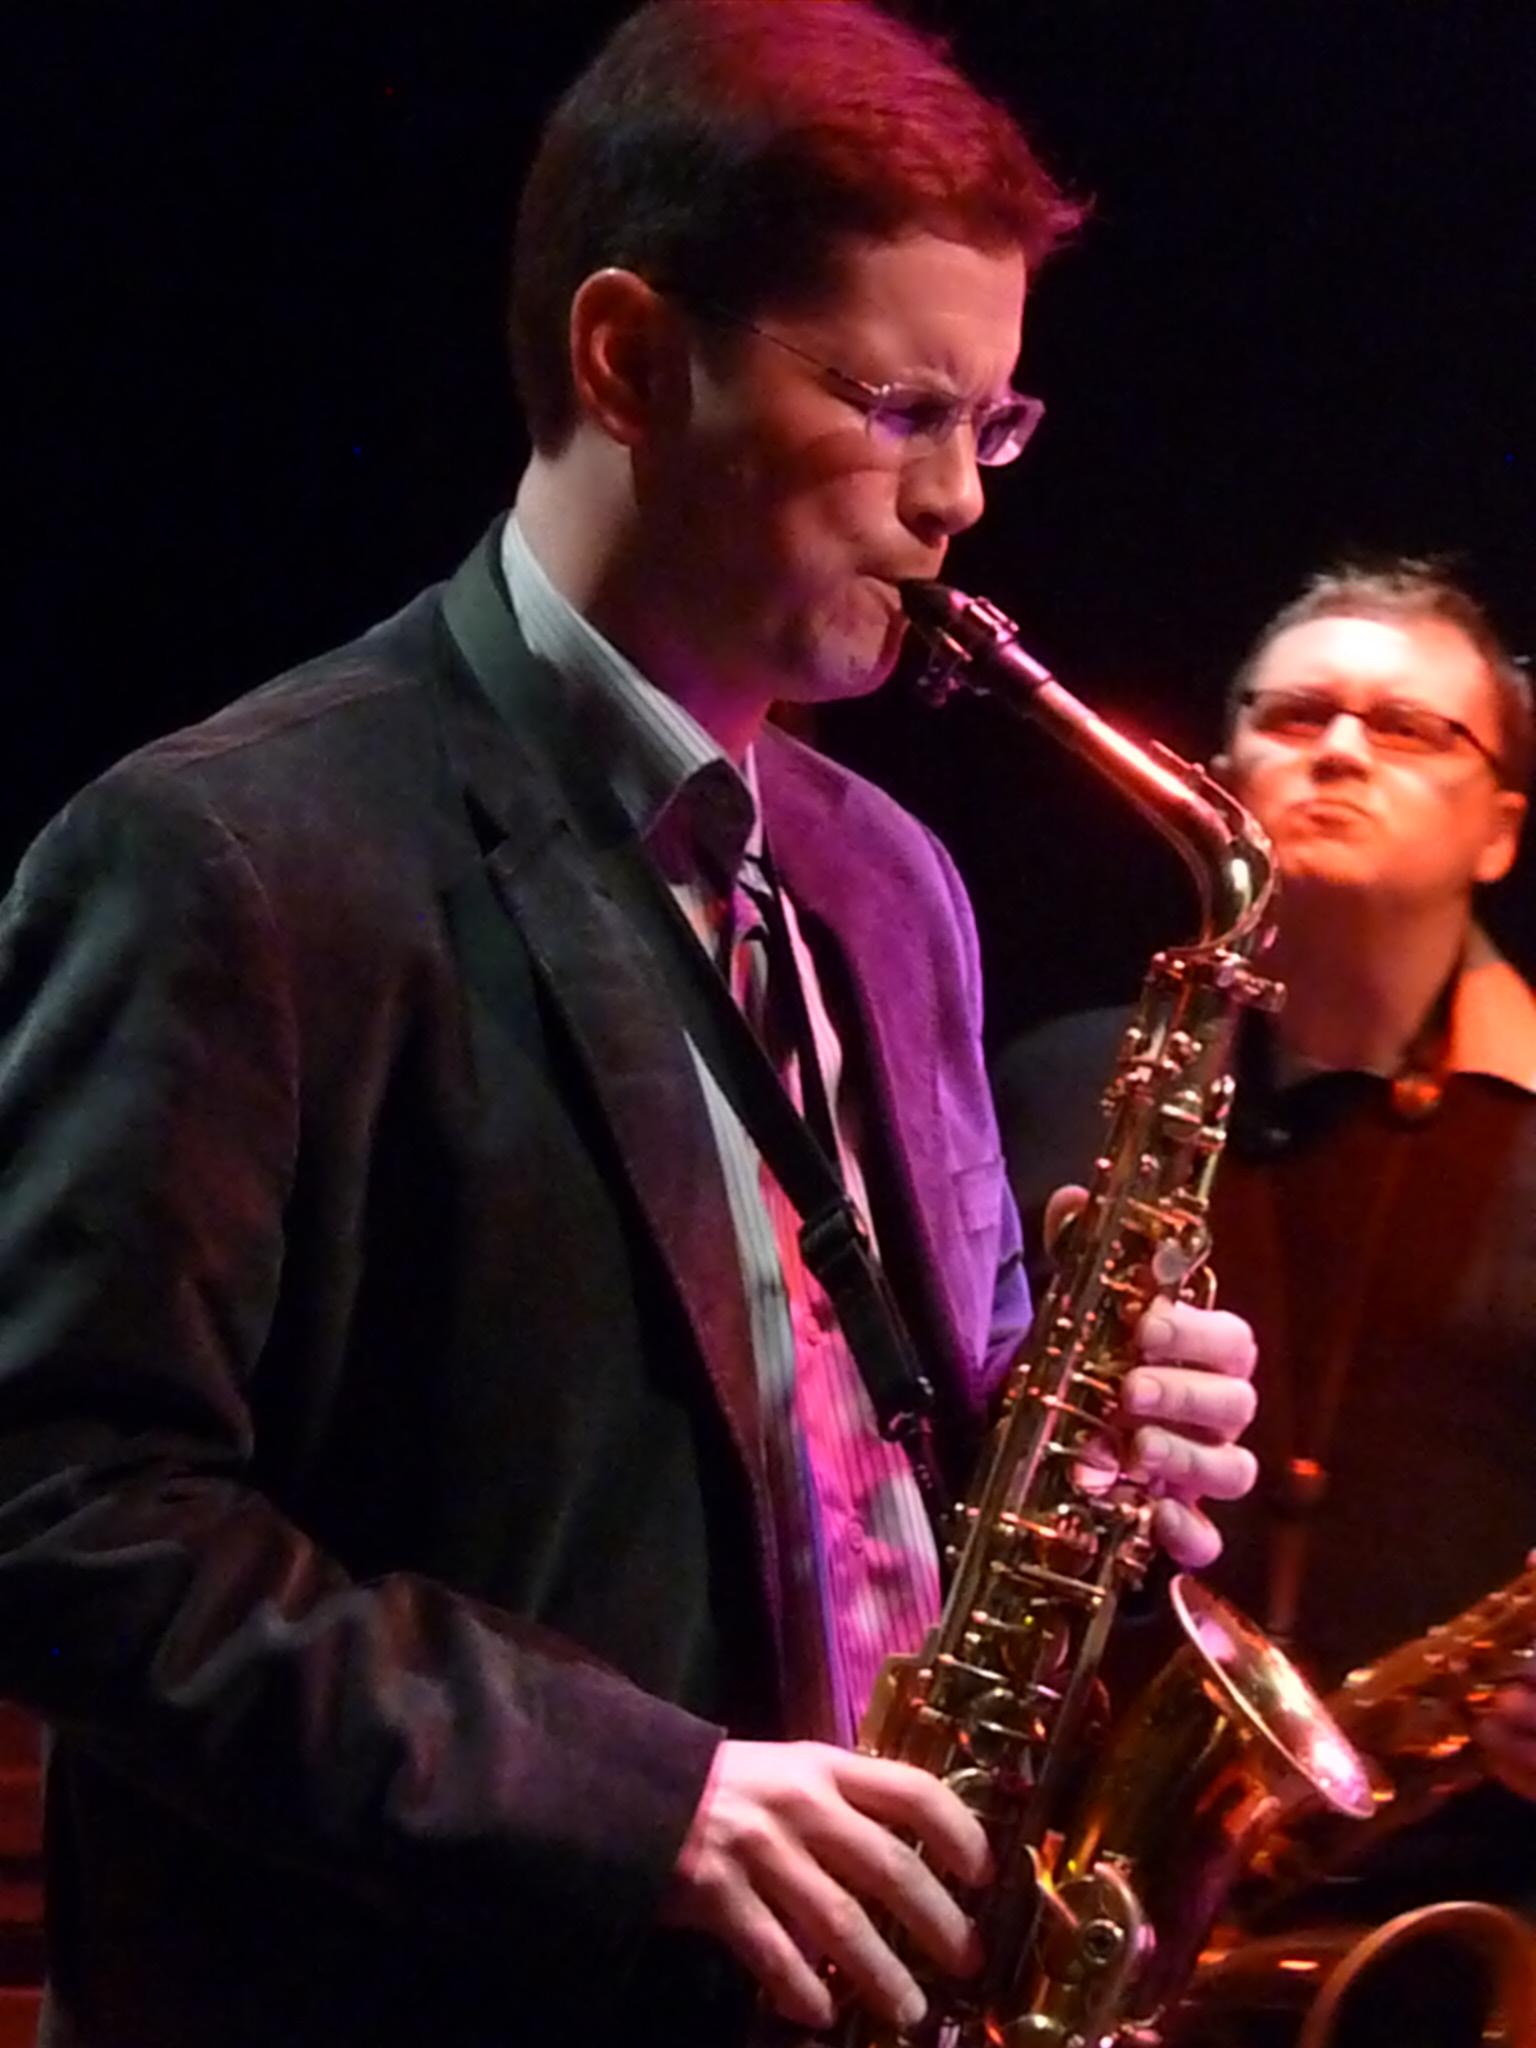 Dave Sterner and Chris Burge